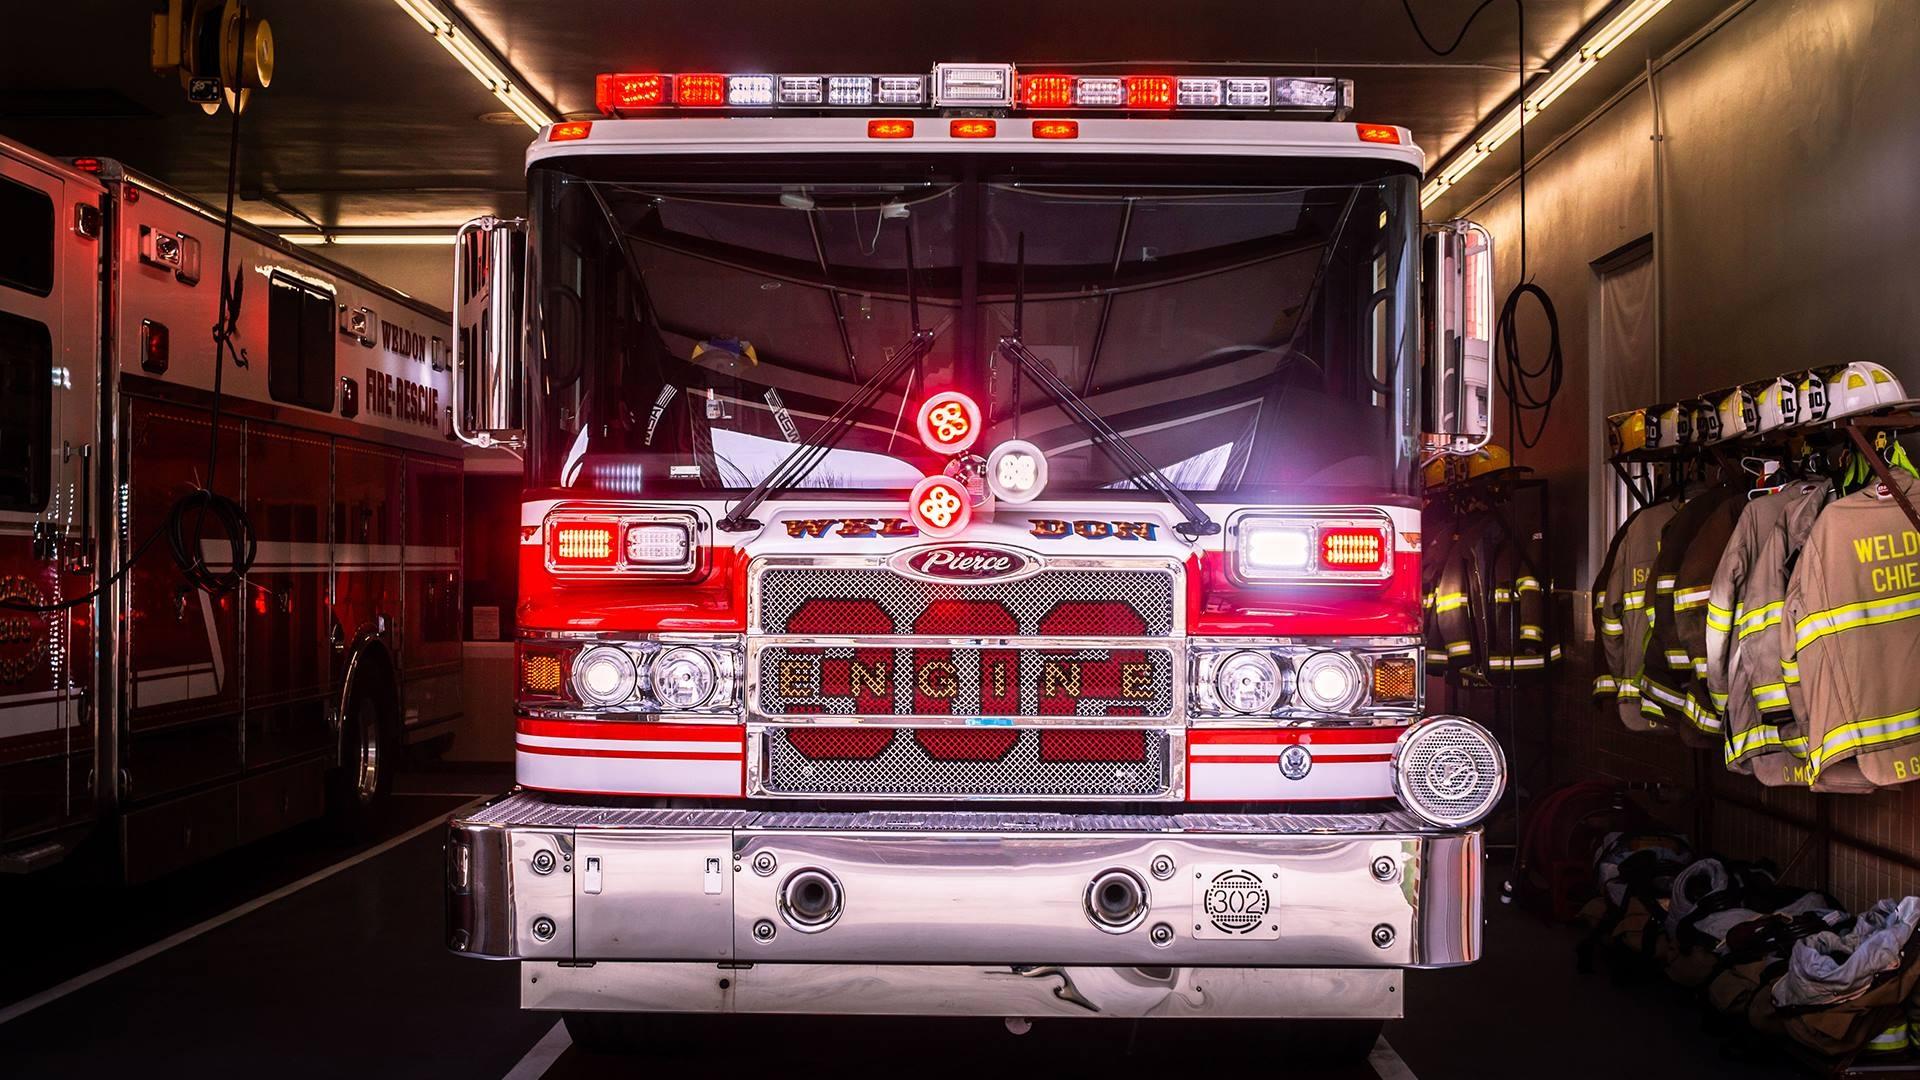 Weldon Fire Company - Fire Engine.jpg